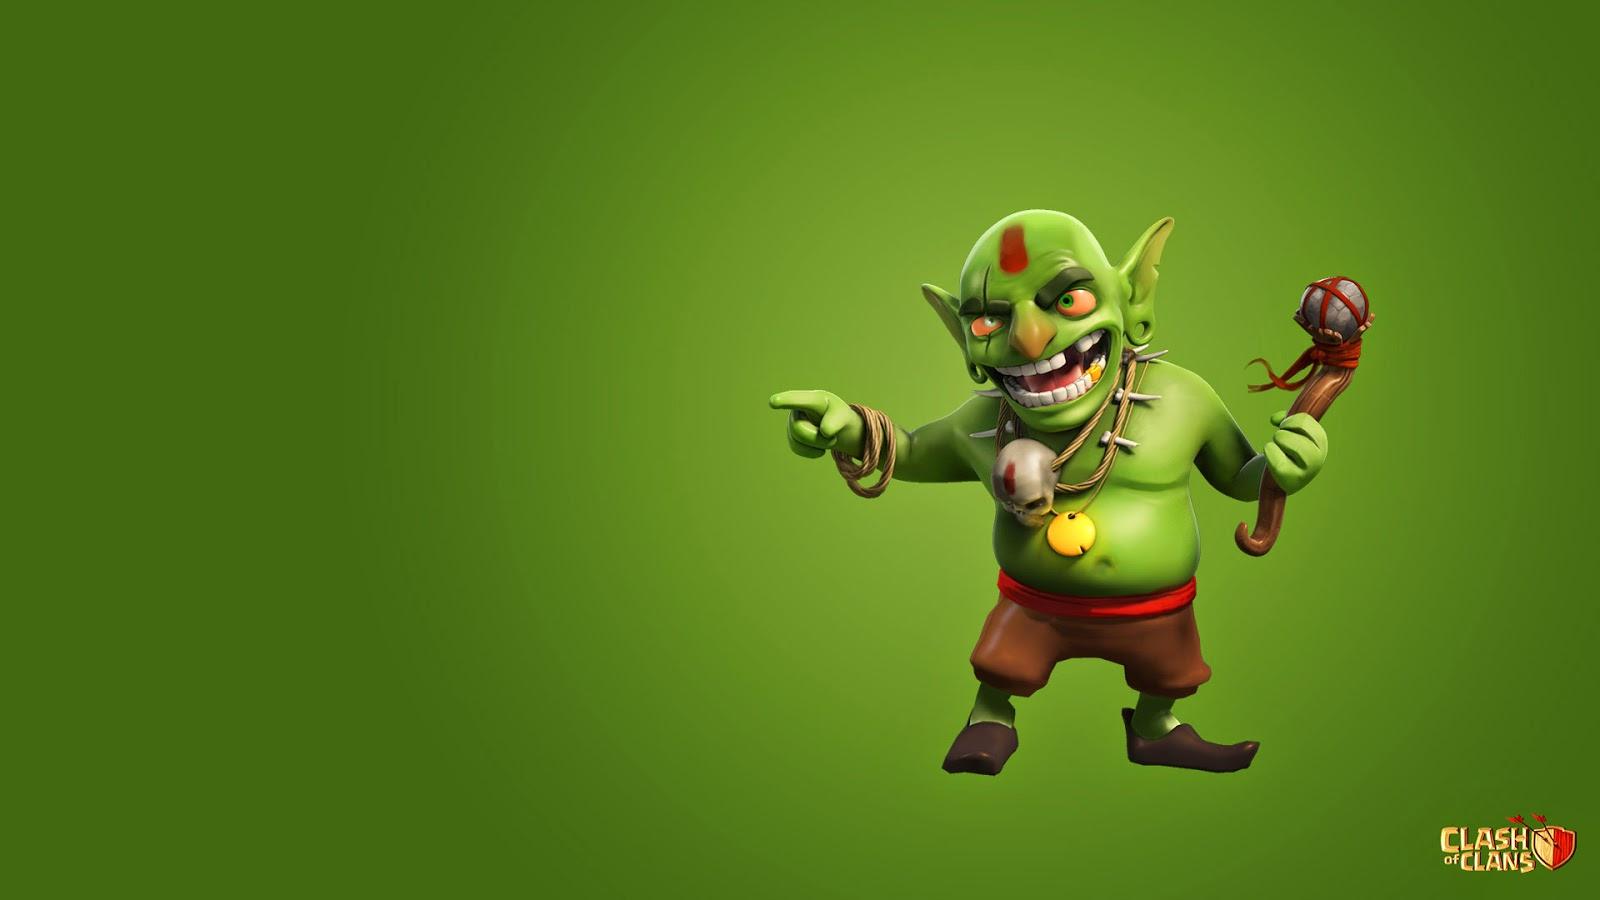 Goblin Clash of Clans HD Wallpaper 1600x900